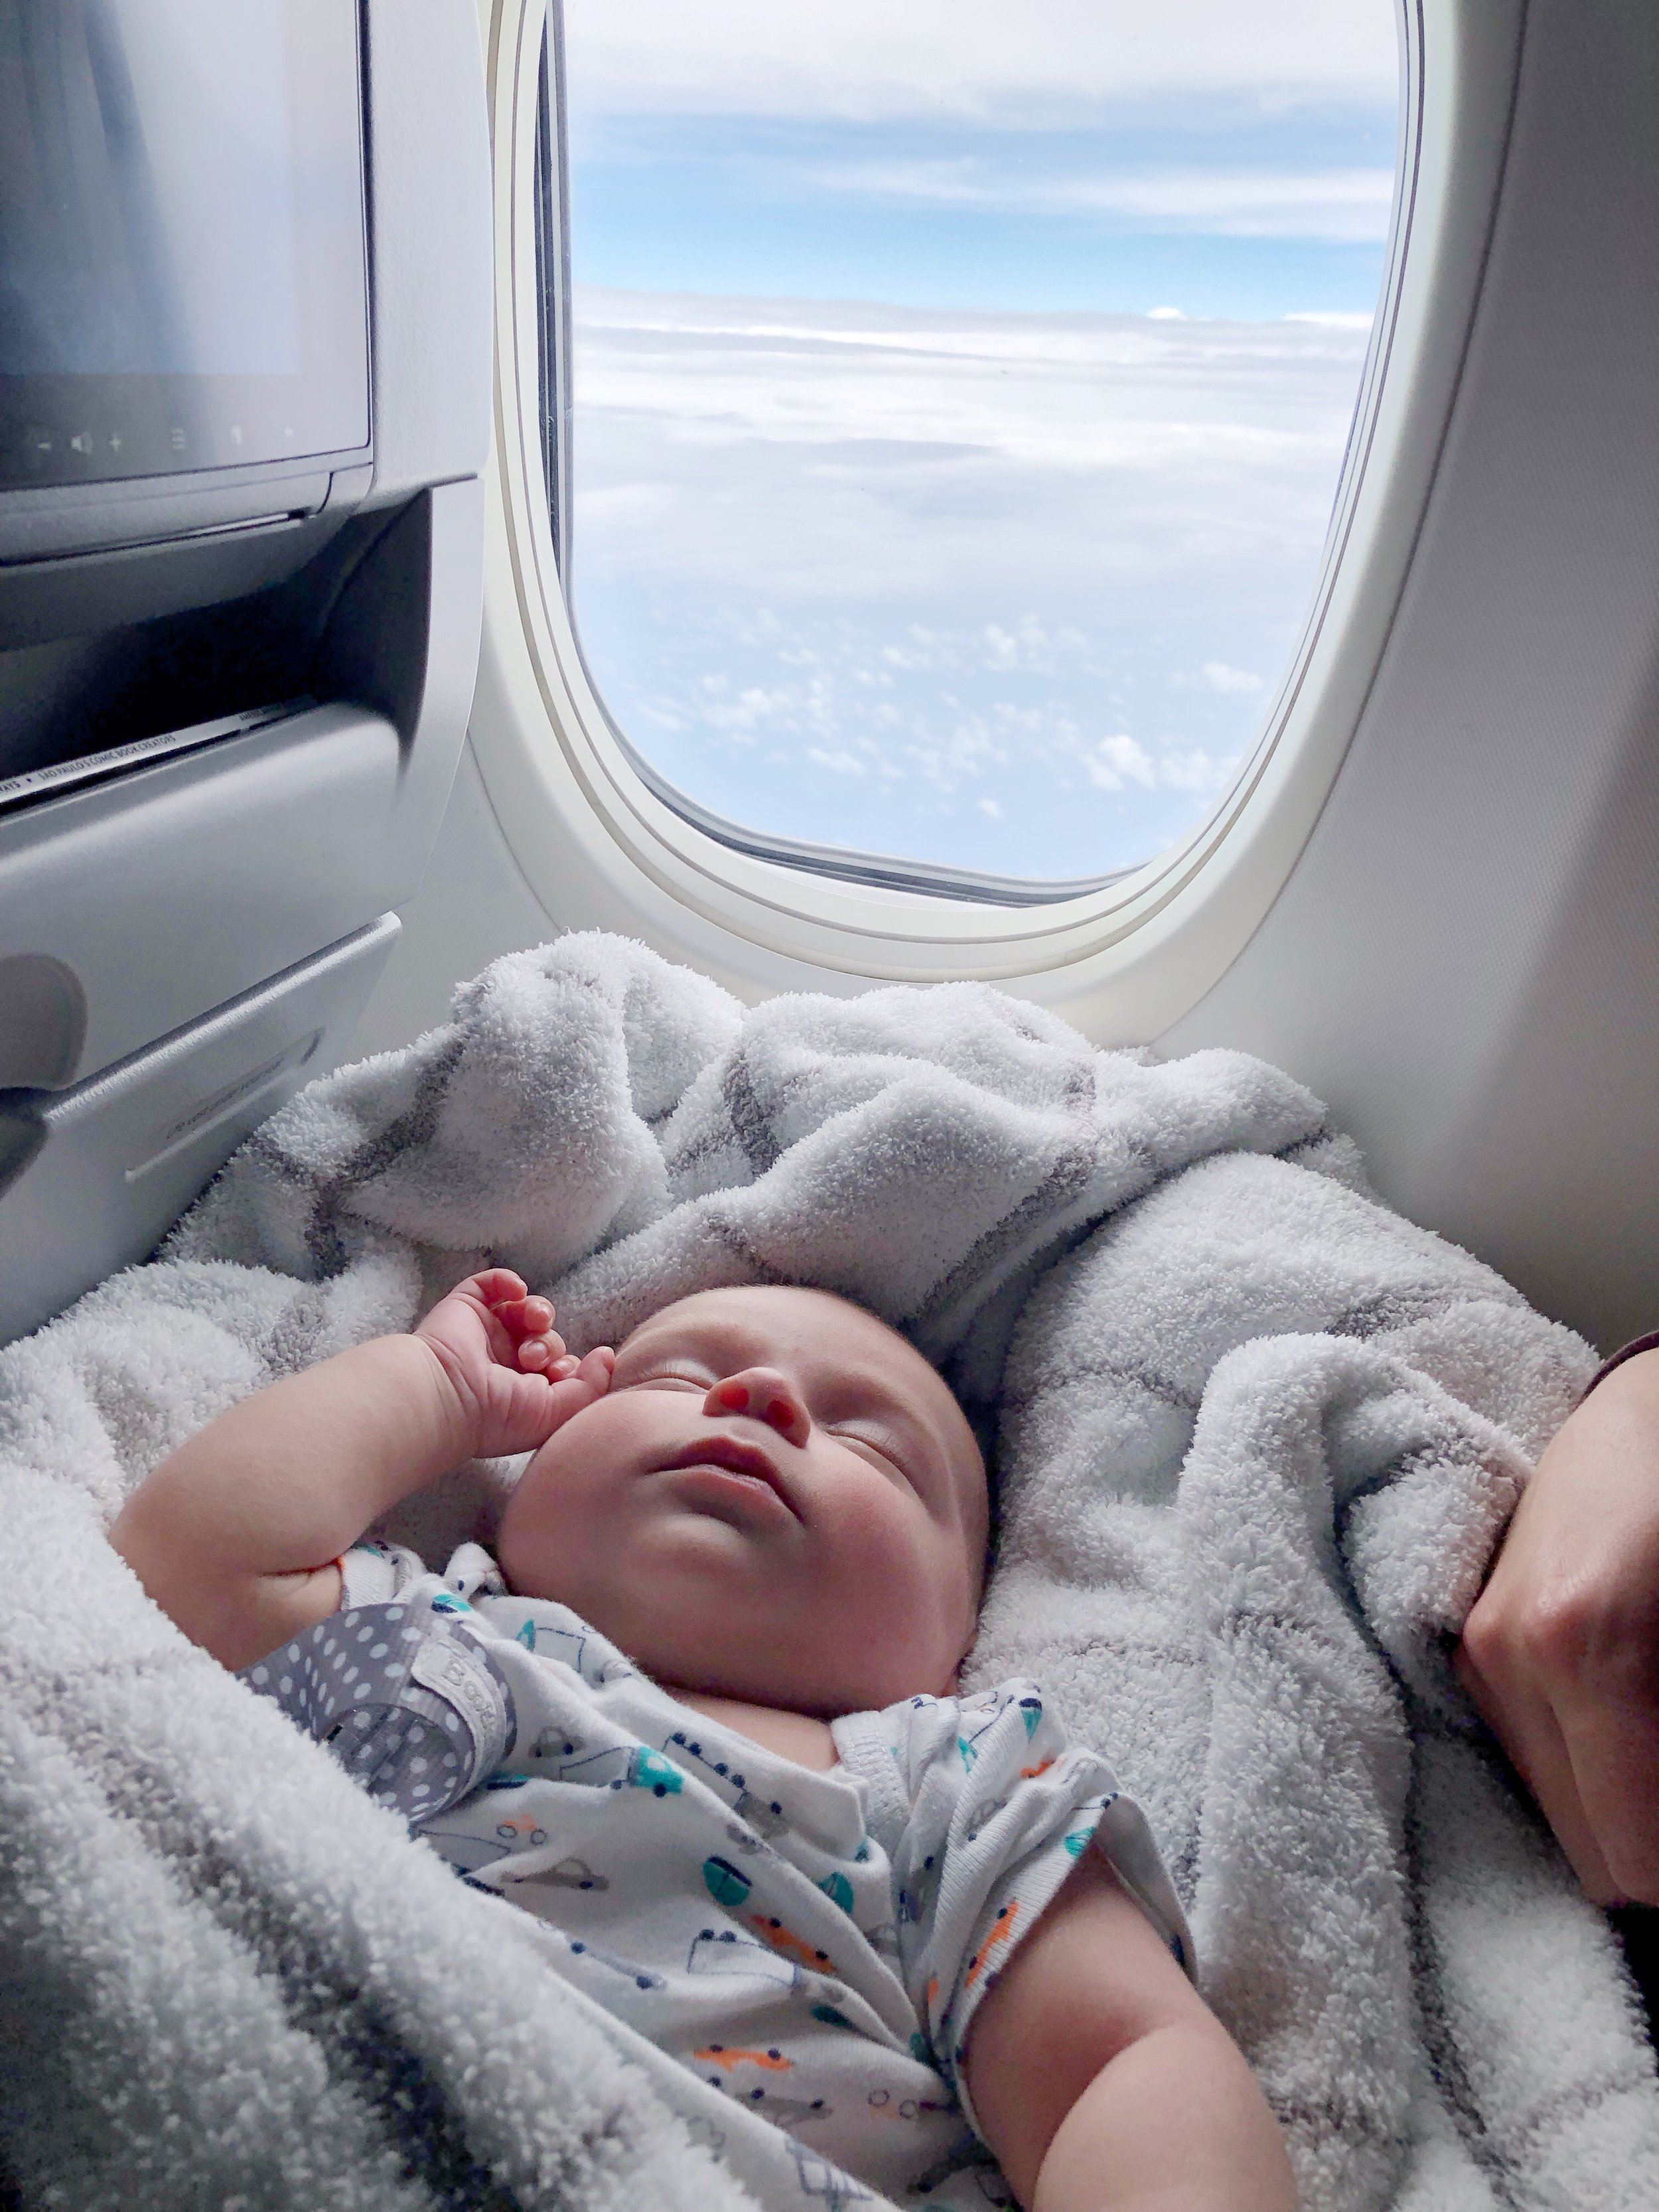 4 Pack NEW BORN Boy Infant Baby Socks 0-6 Month Car Plane Trunk Pattern Design